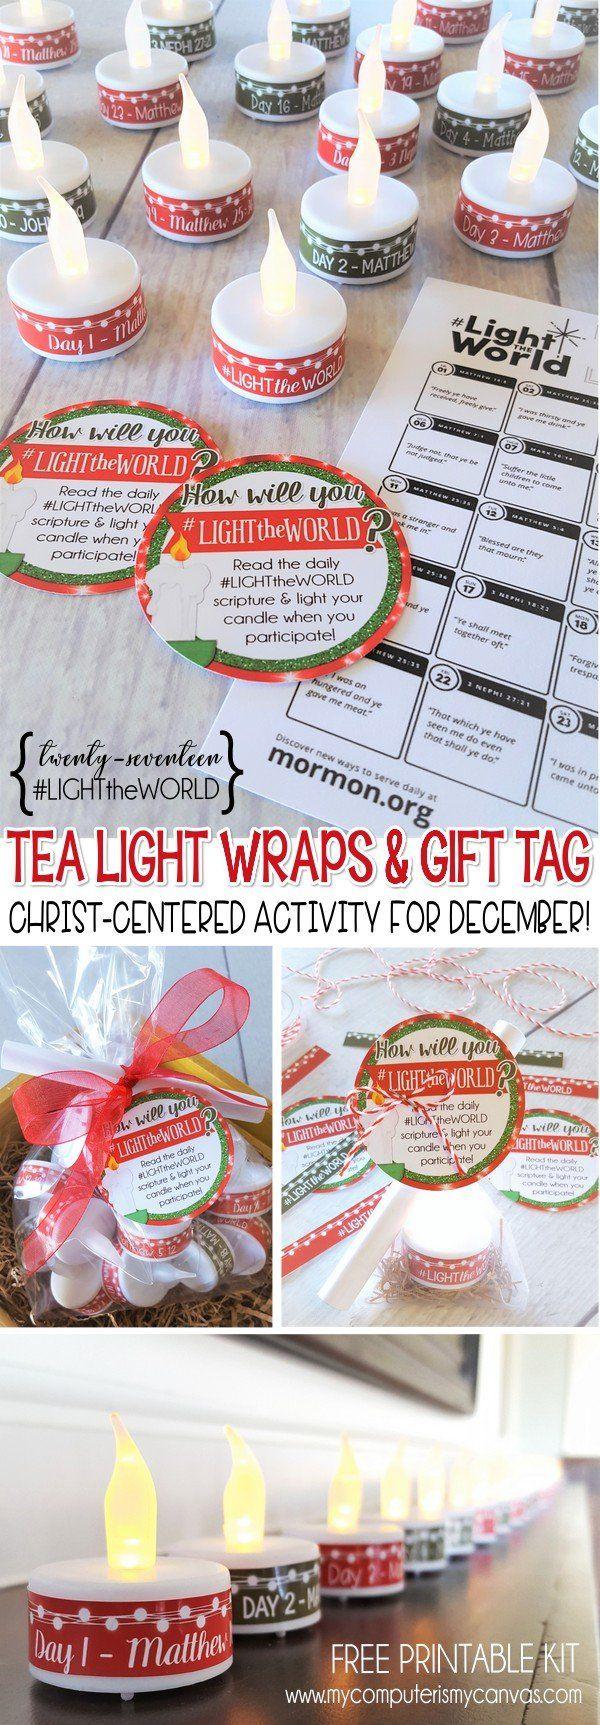 2017 #LIGHTtheWORLD FREE Printable Kit, tea light wraps + calendar and gift tag - LIGHT THE WORLD  #mycomputerismycanvas